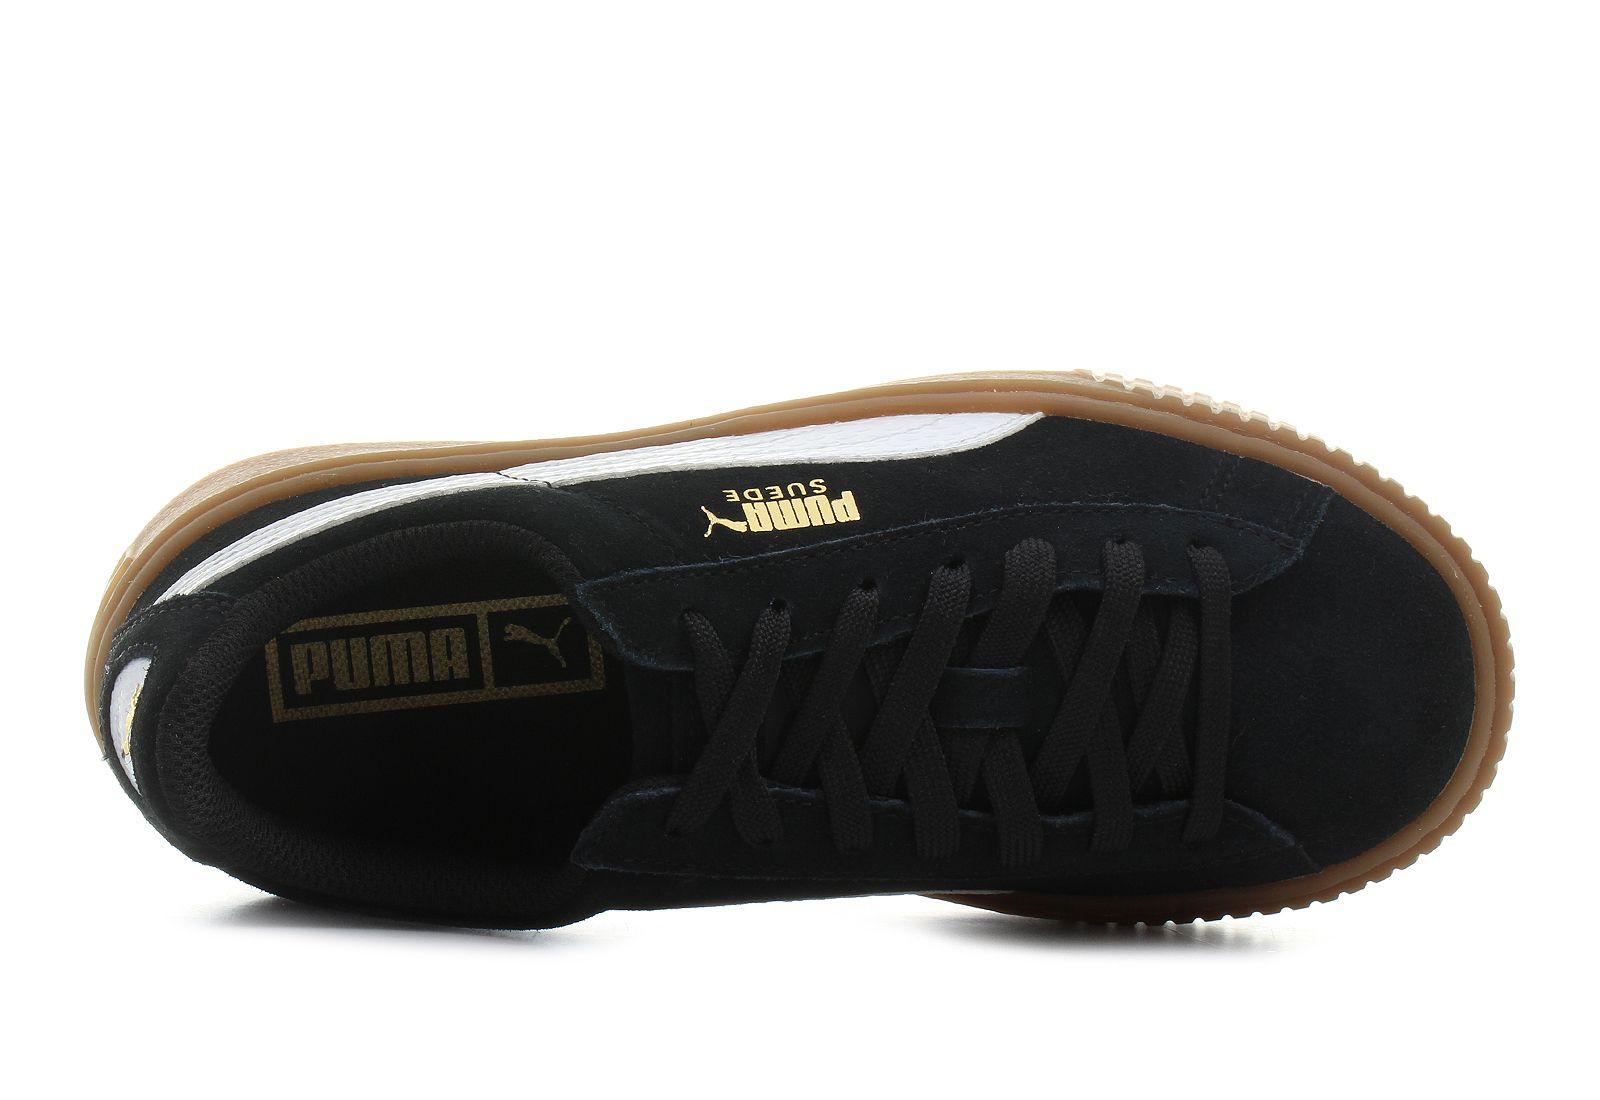 5a27bca4decd Puma Cipő - Suede Platform Snake Jr - 36390602-blk - Office Shoes ...